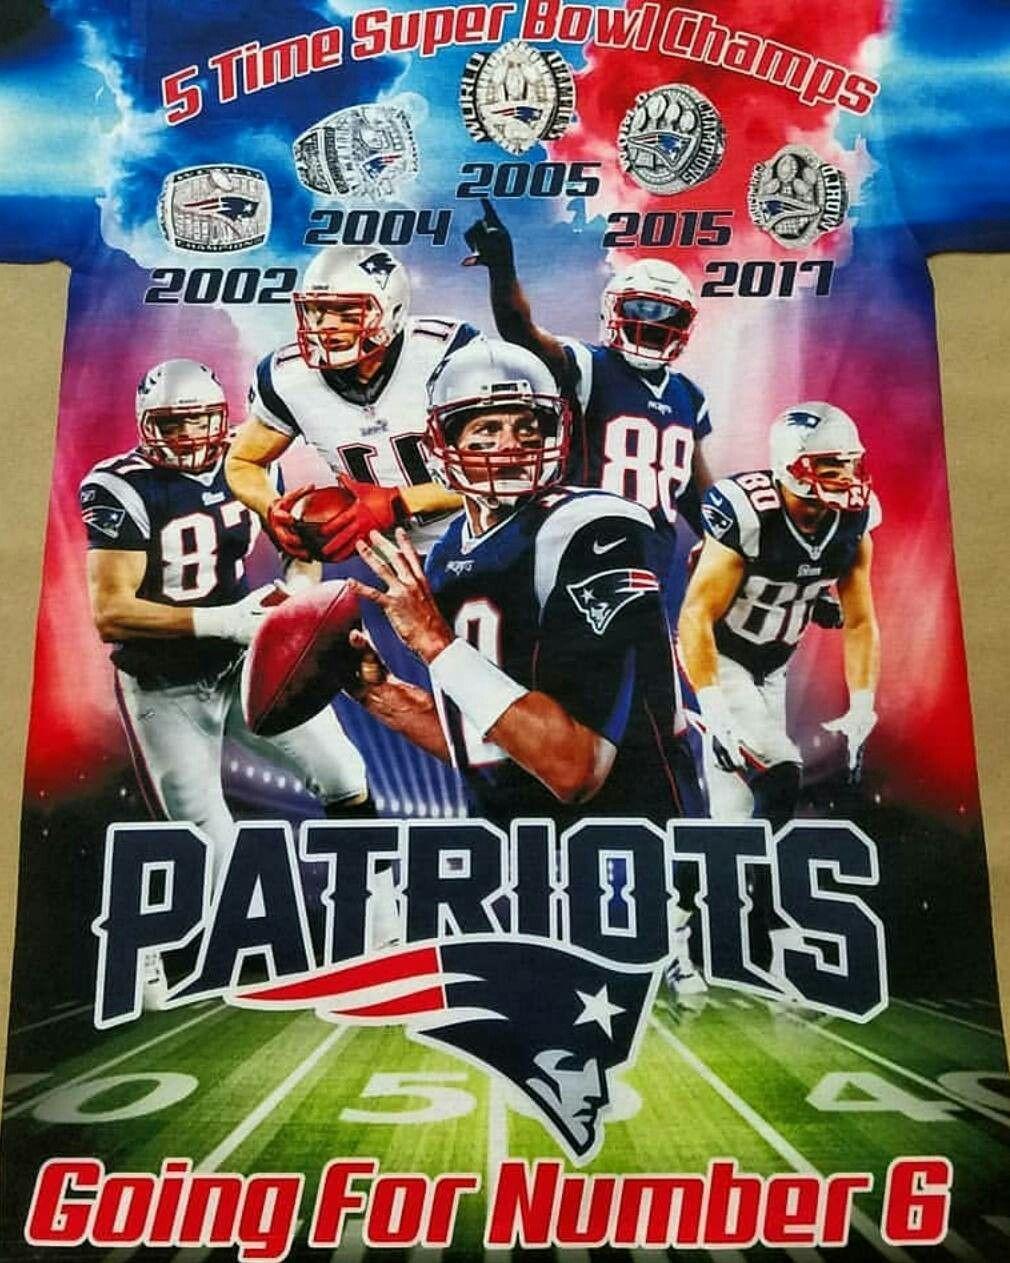 Ya Baby Lfg 6 Beatla Dodamage2 New England Patriots Cheerleaders New England Patriots Merchandise Patriots Cheerleaders